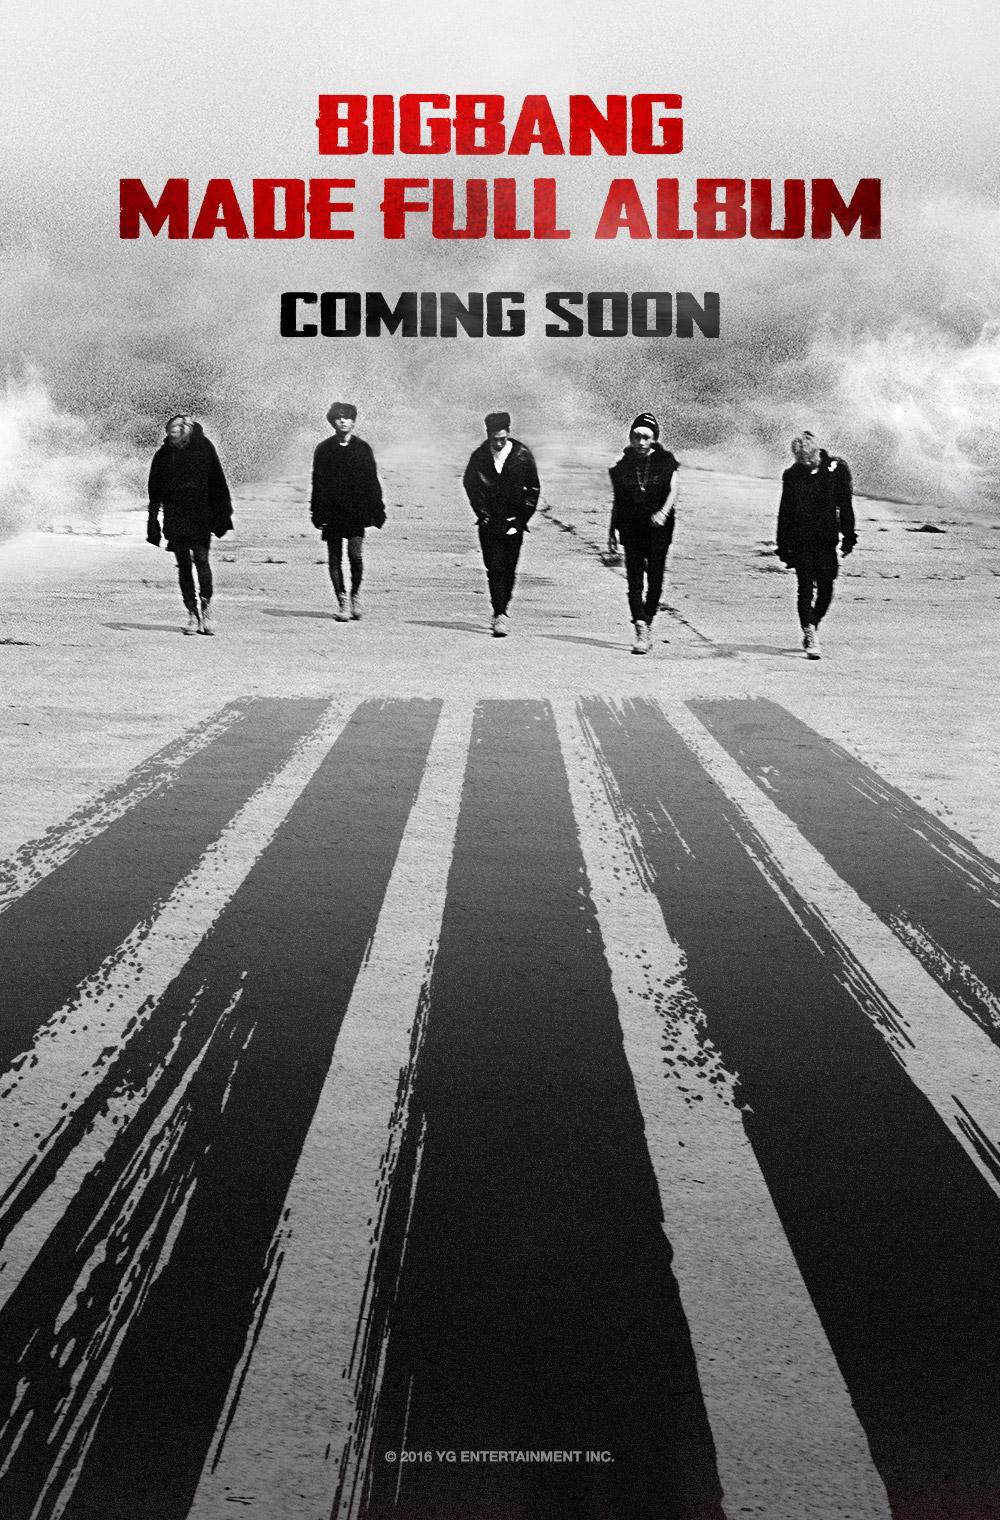 kpop-big-bang-made-full-album-comeback-teaser-2016